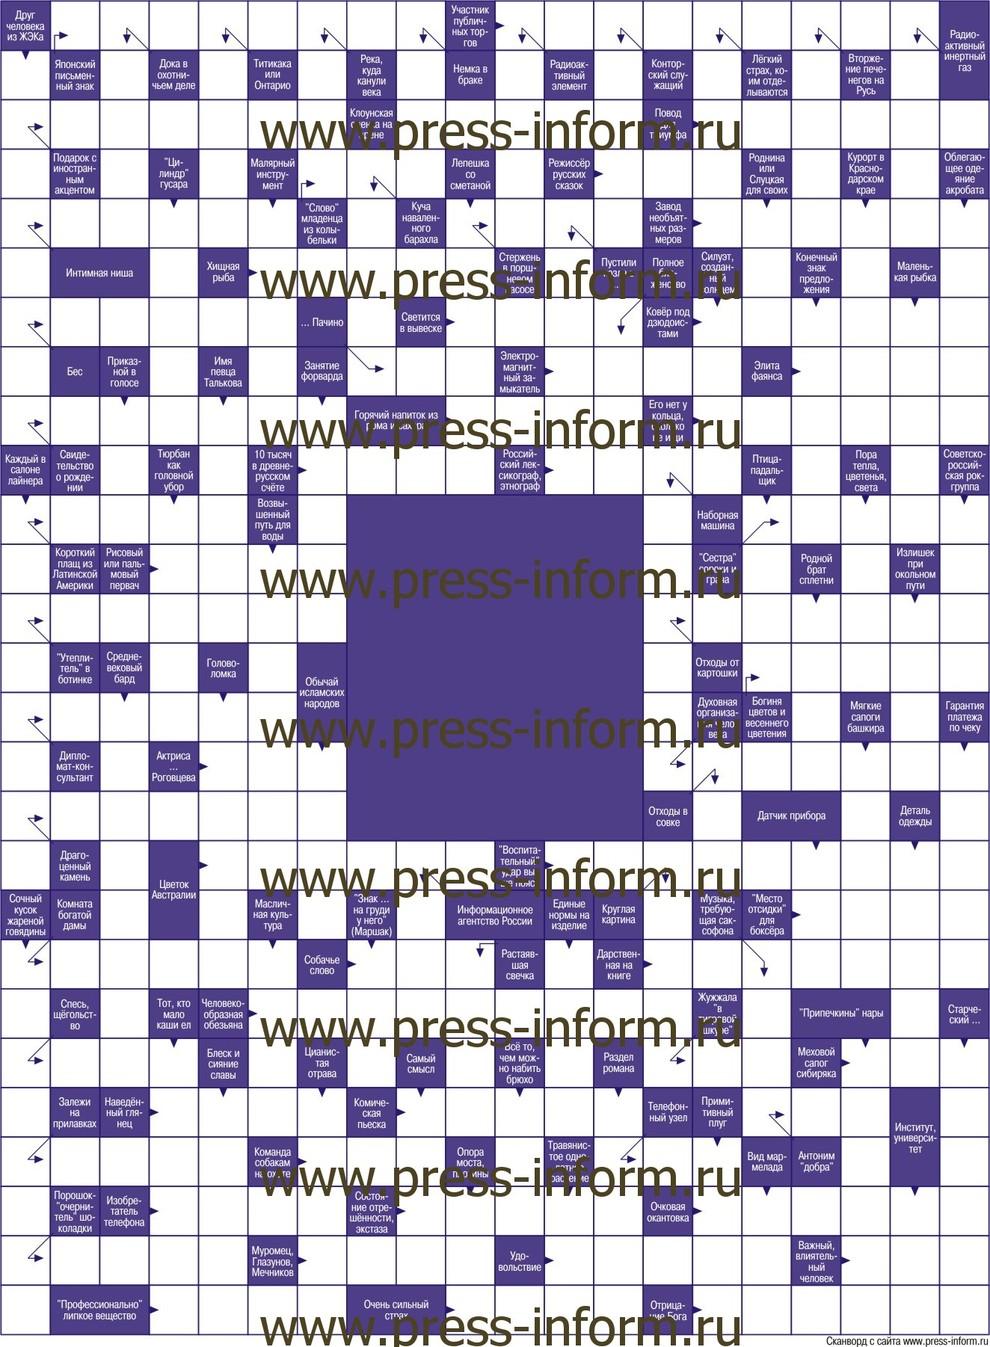 —канворд  lx клеток, пустой блок 6х7